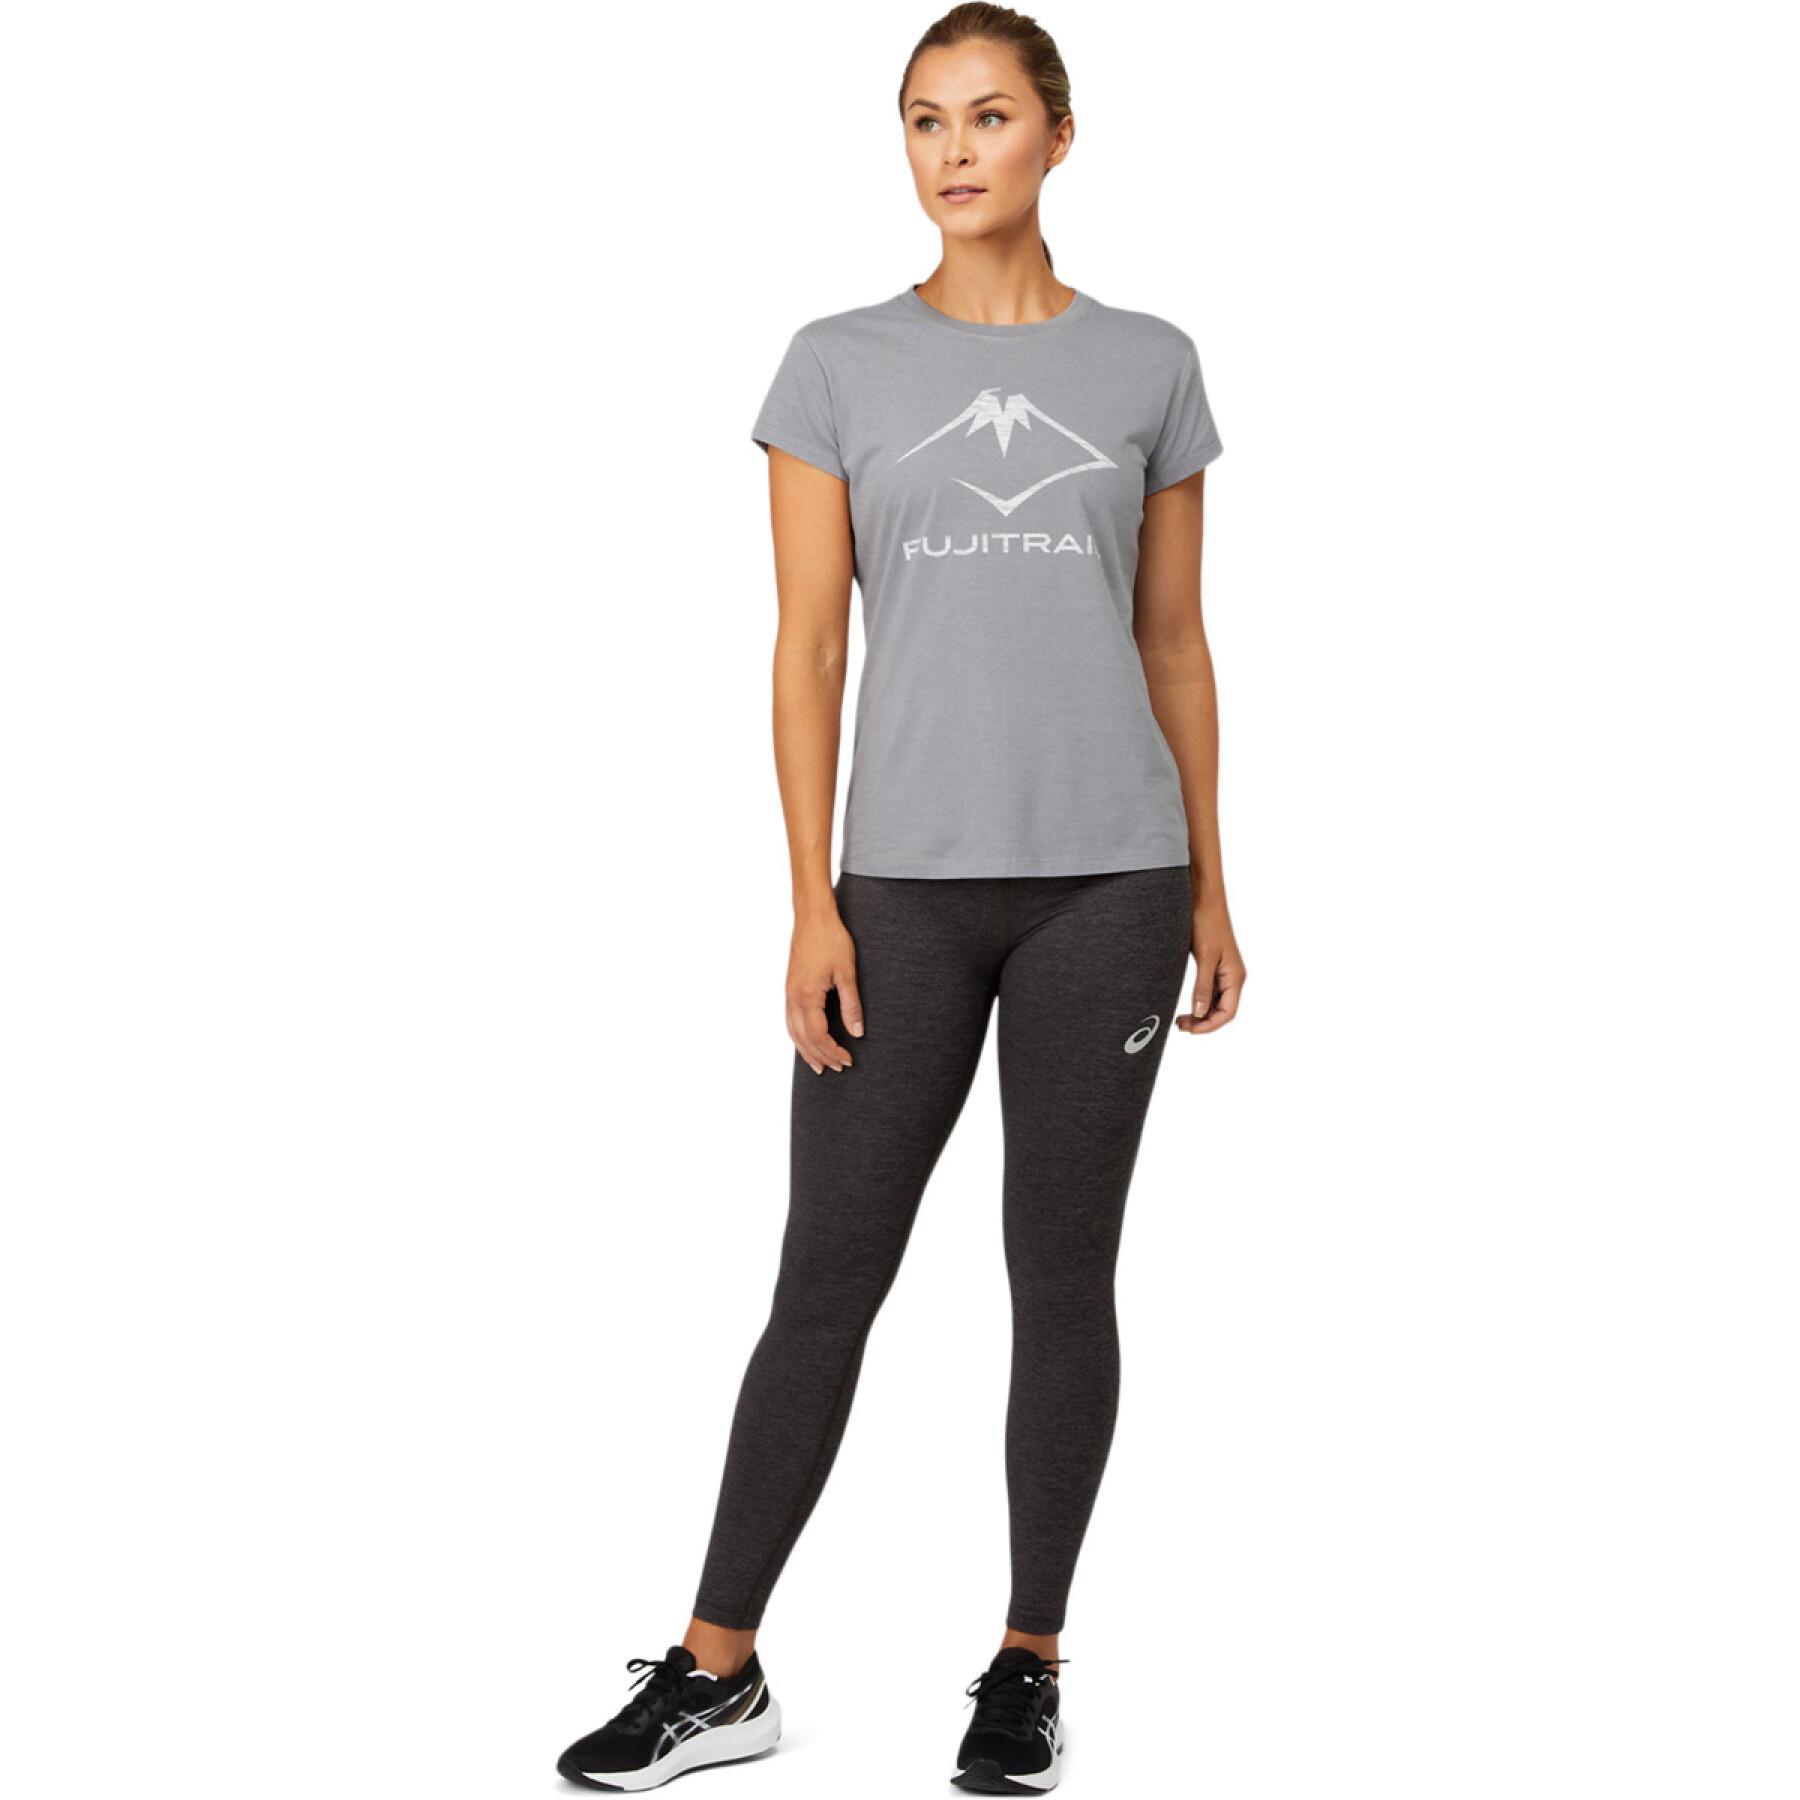 Women's T-shirt Asics Fuji Trail Tea